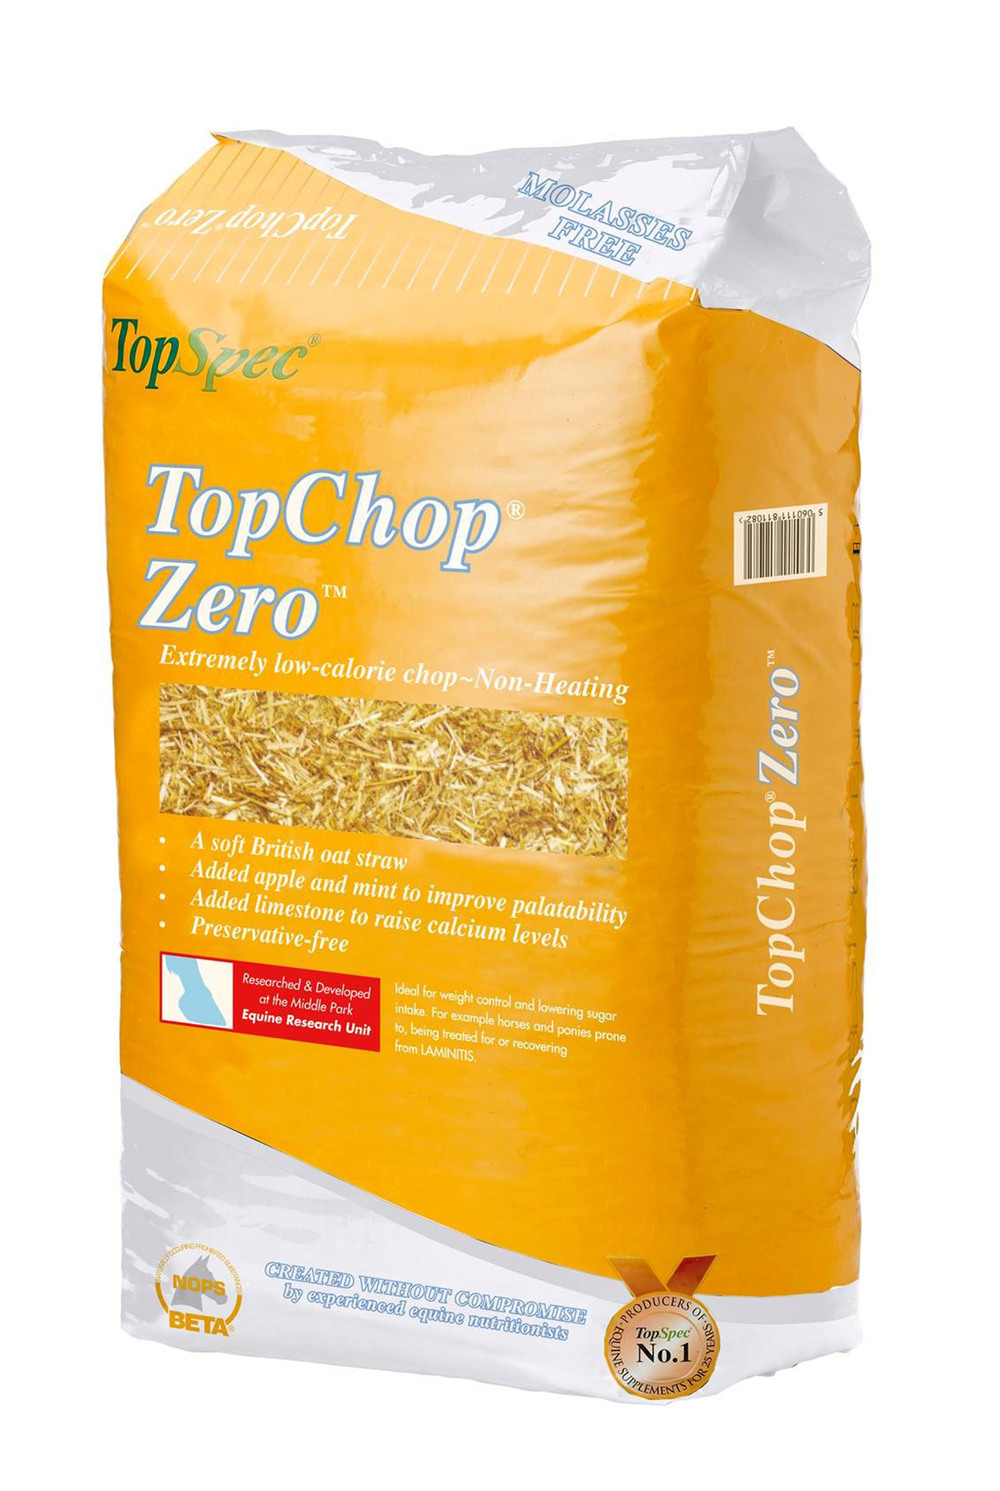 Topchop zero